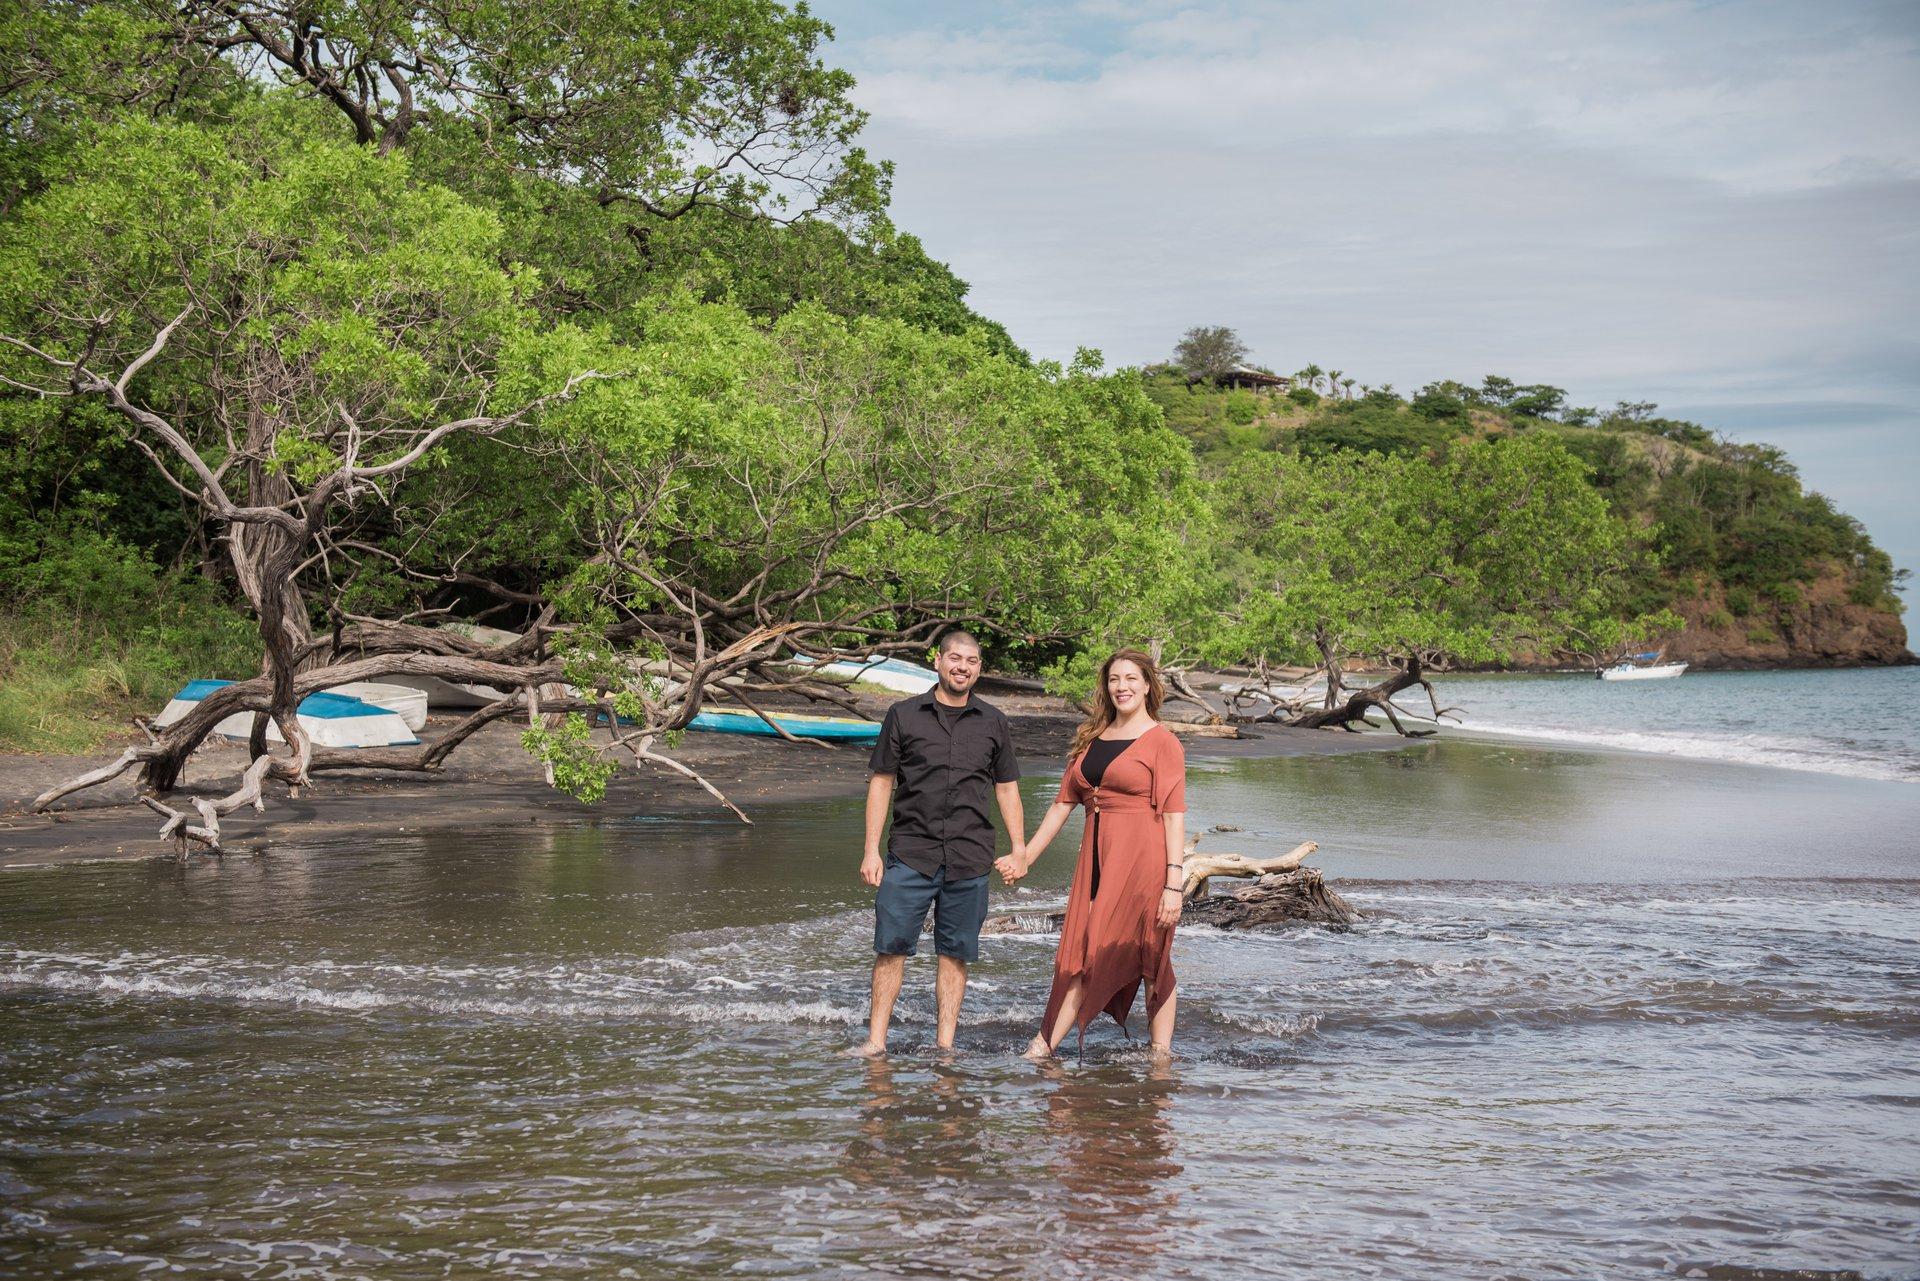 Guanacaste-Costa Rica-travel-story-Flytographer-10